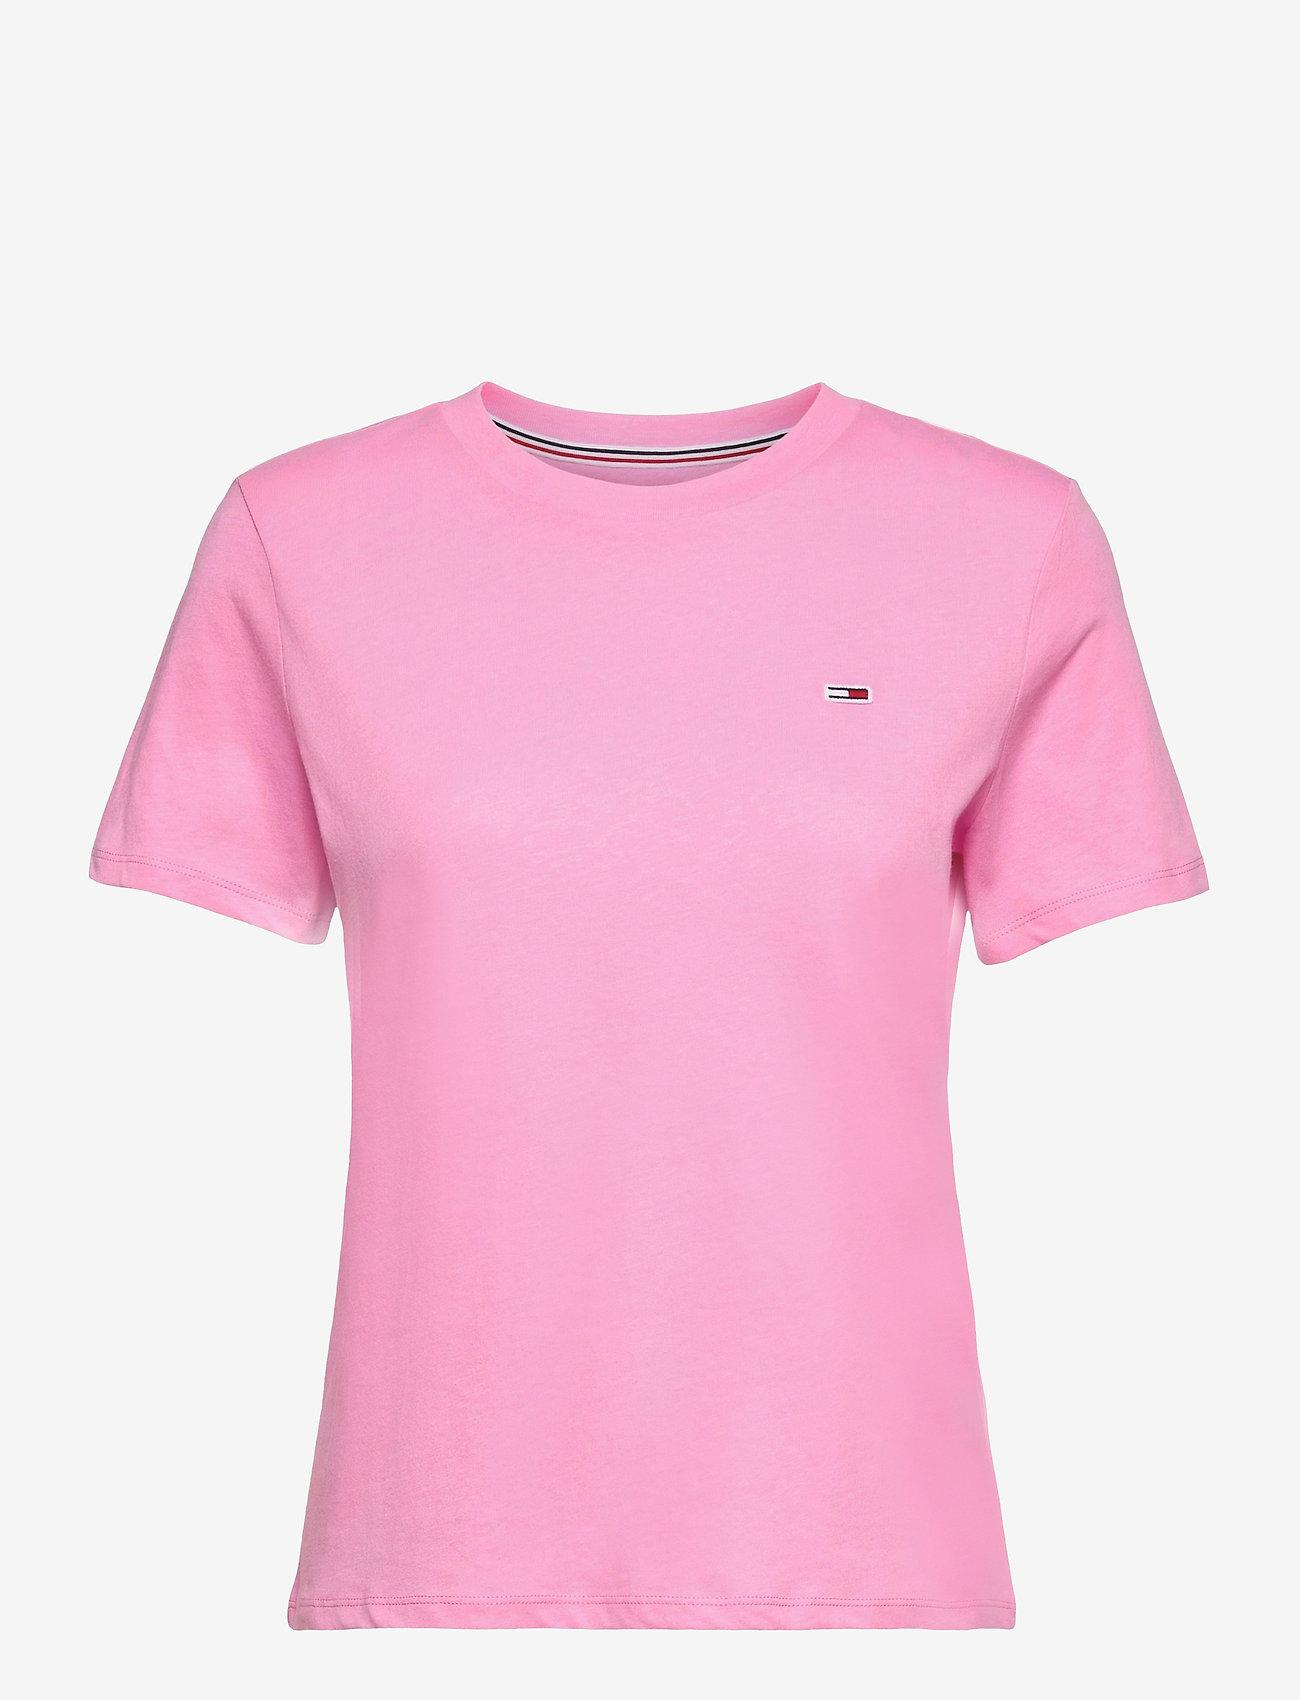 Tommy Jeans - TJW REGULAR JERSEY C NECK - t-shirts - pink daisy - 0